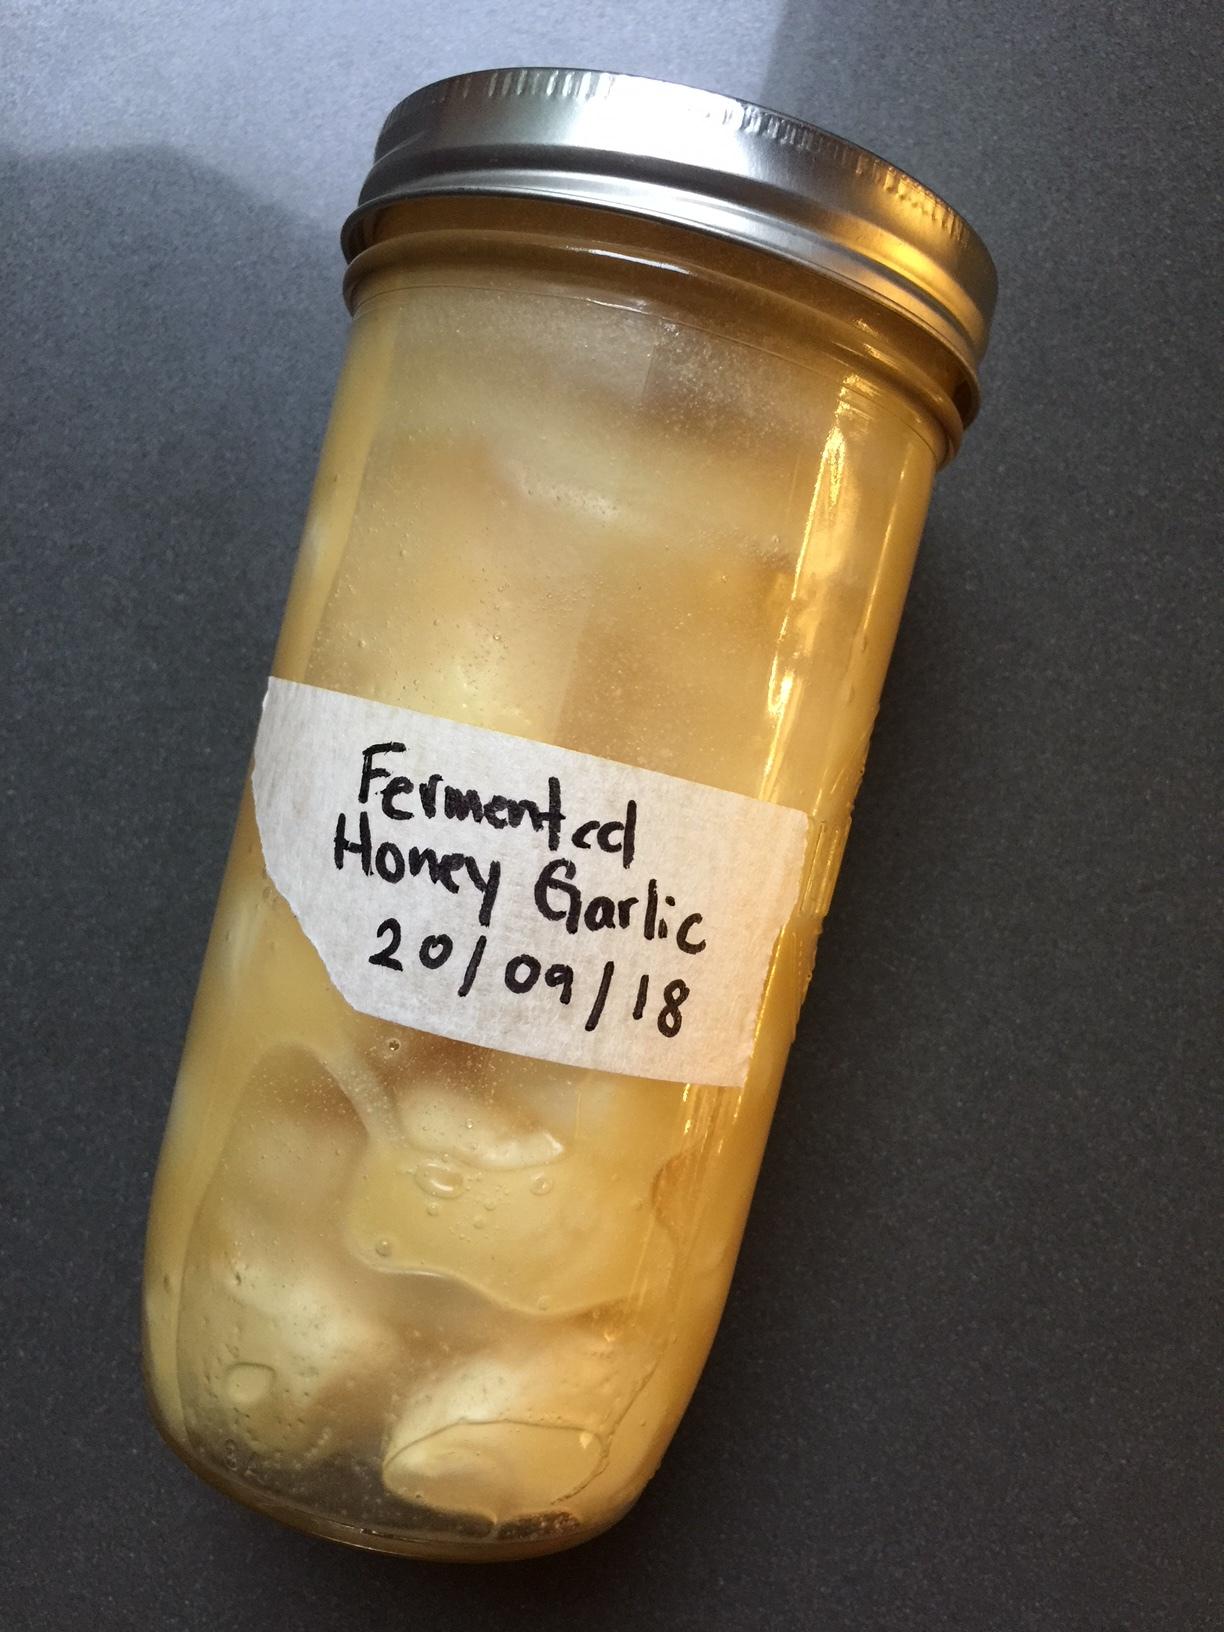 Fermented Honey Garlic Ferments Fermented Honey Garlic